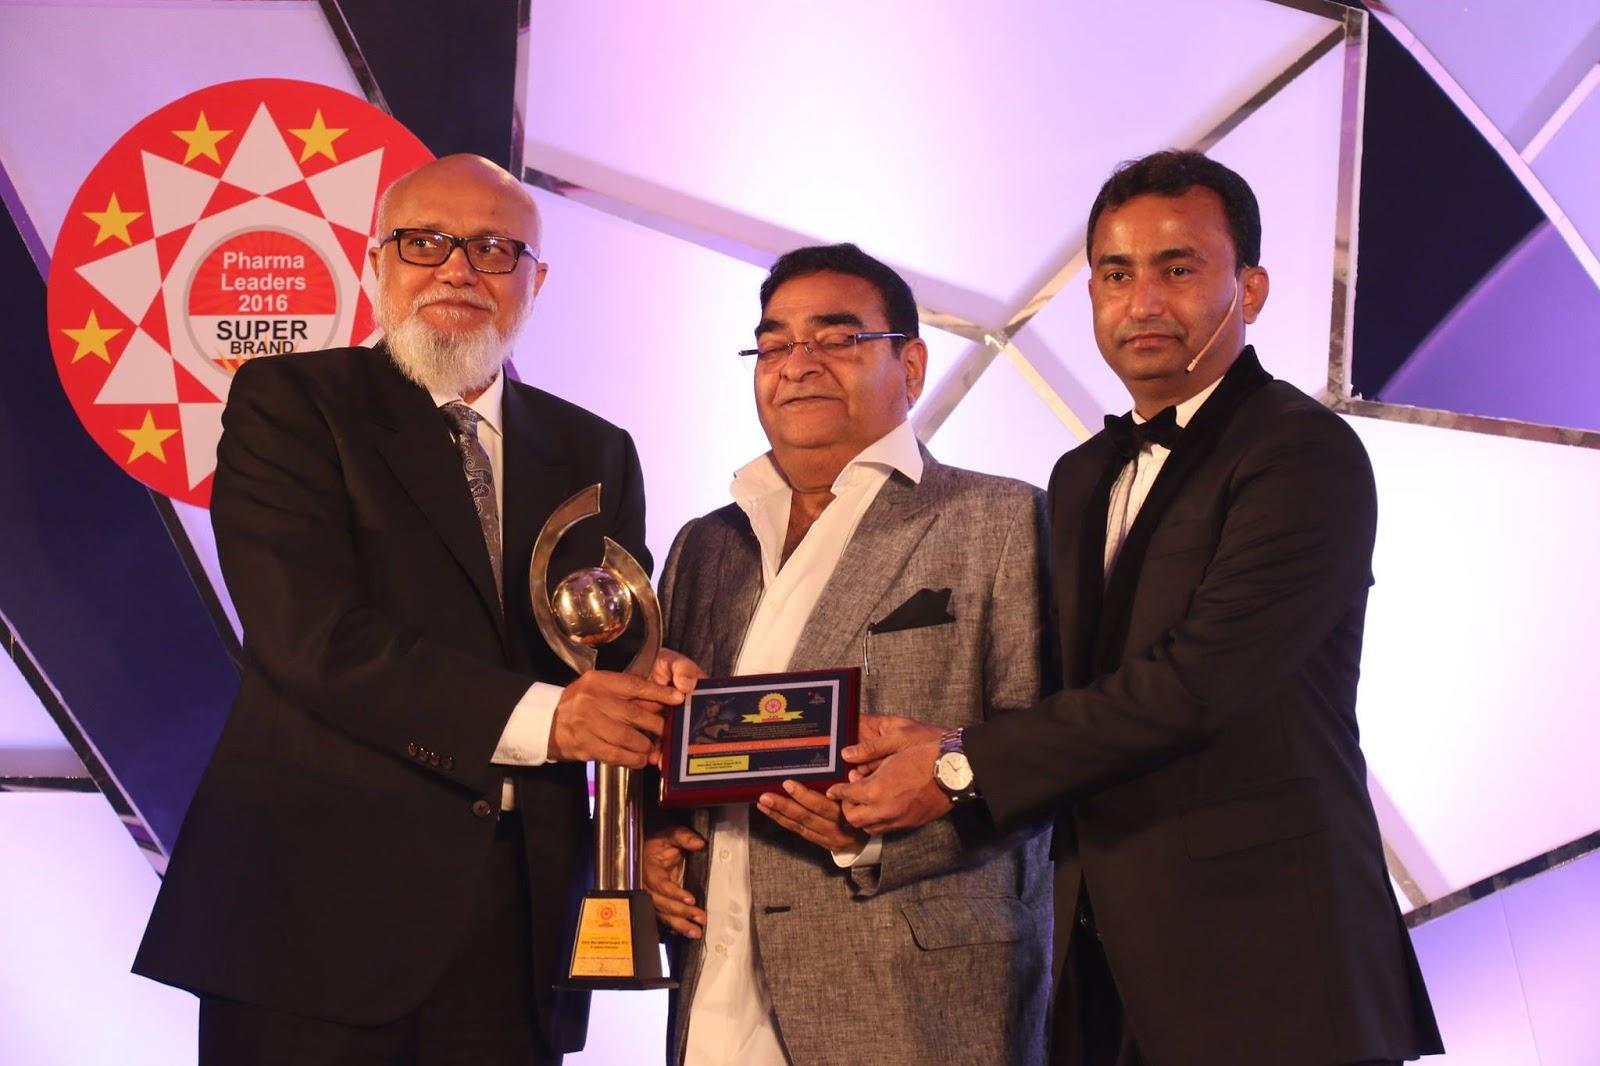 Dr. Sudhansu Bhattacharya